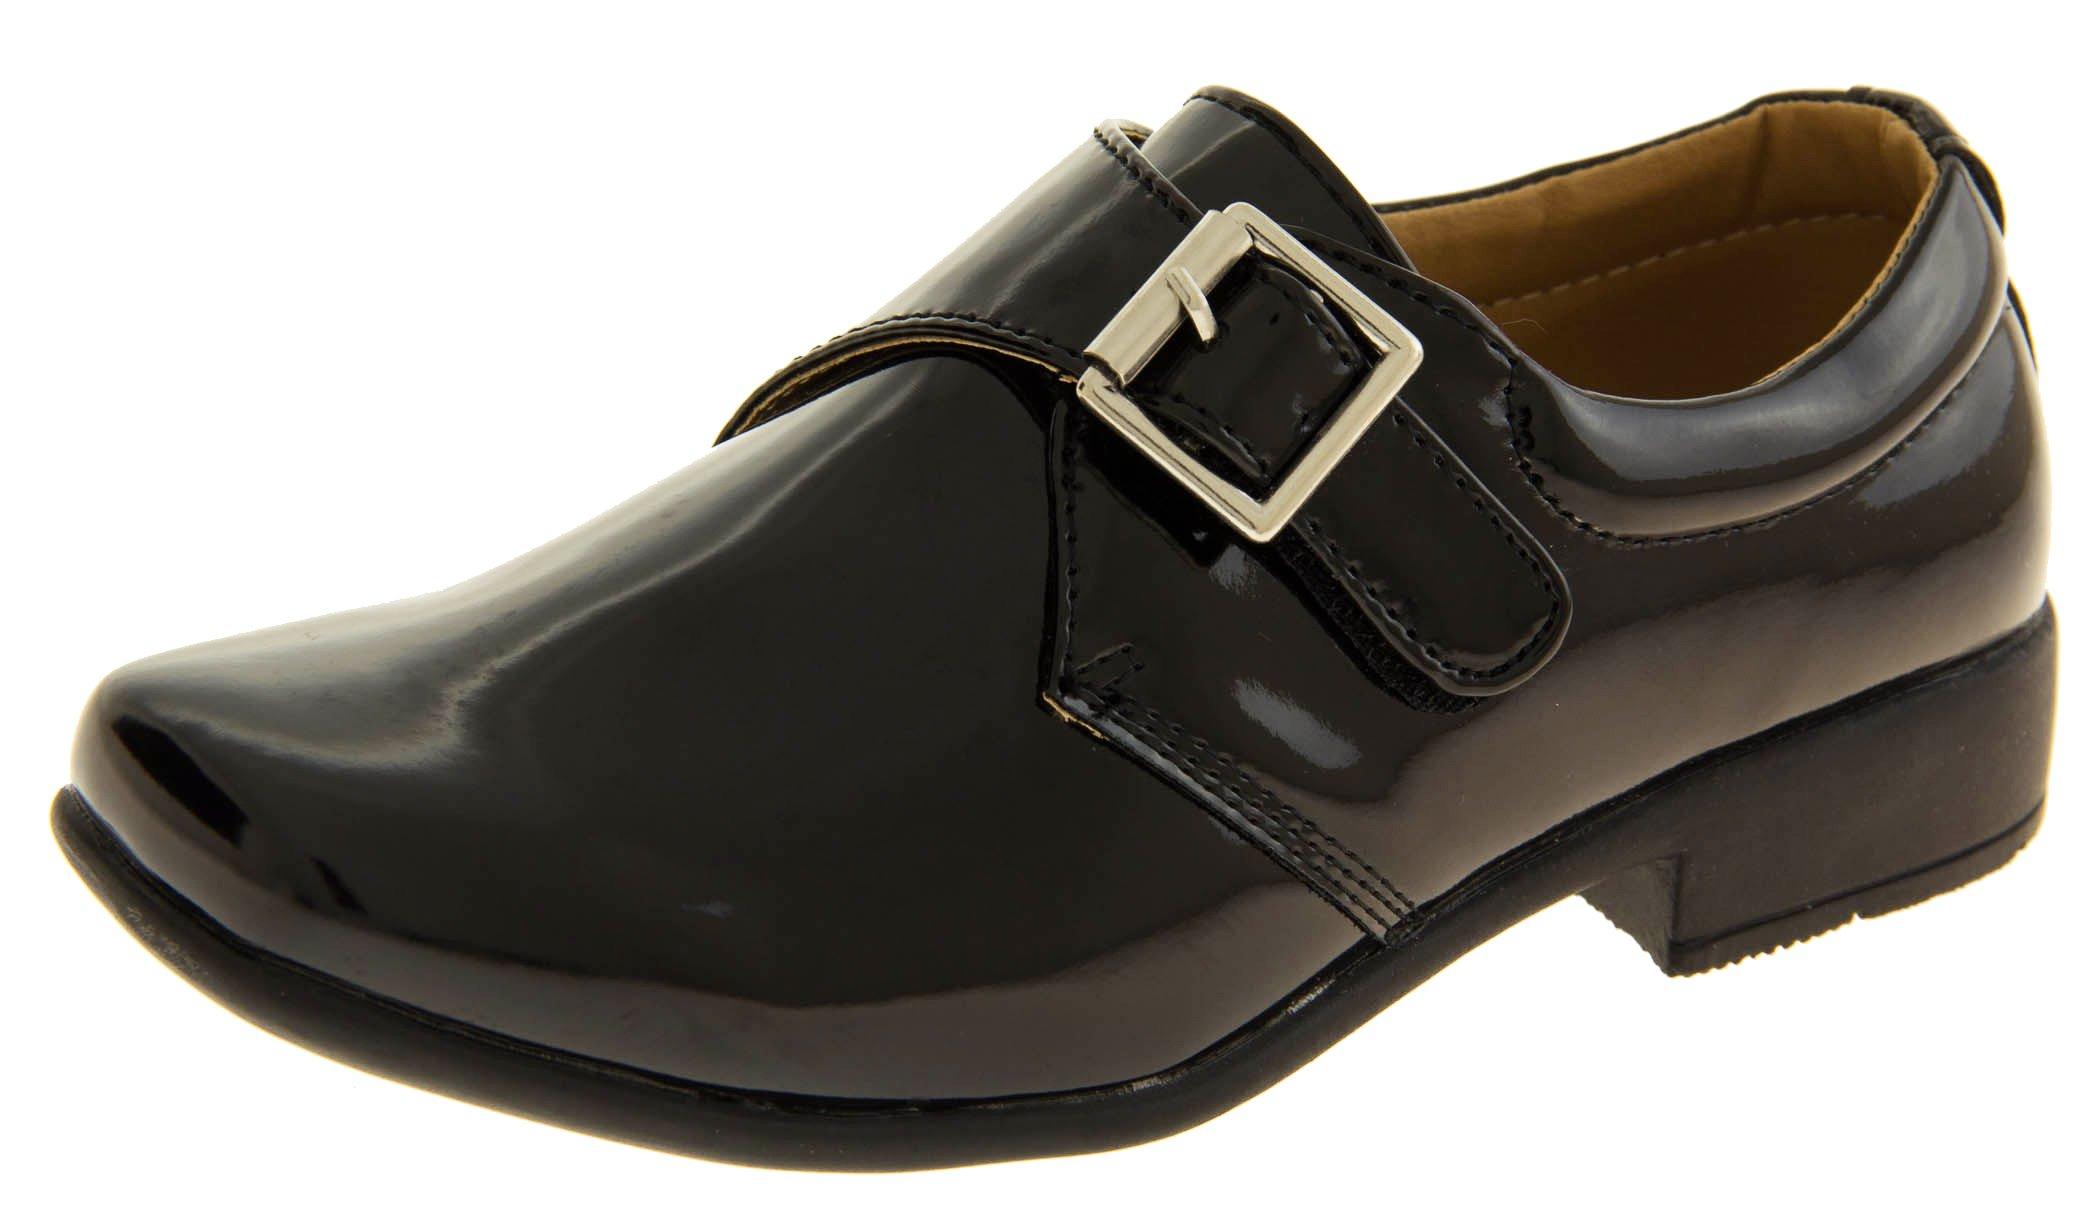 Rsb Boys Monk Black (patent/shiny) Faux Patent Leather Formal Shoes US 11 Kids